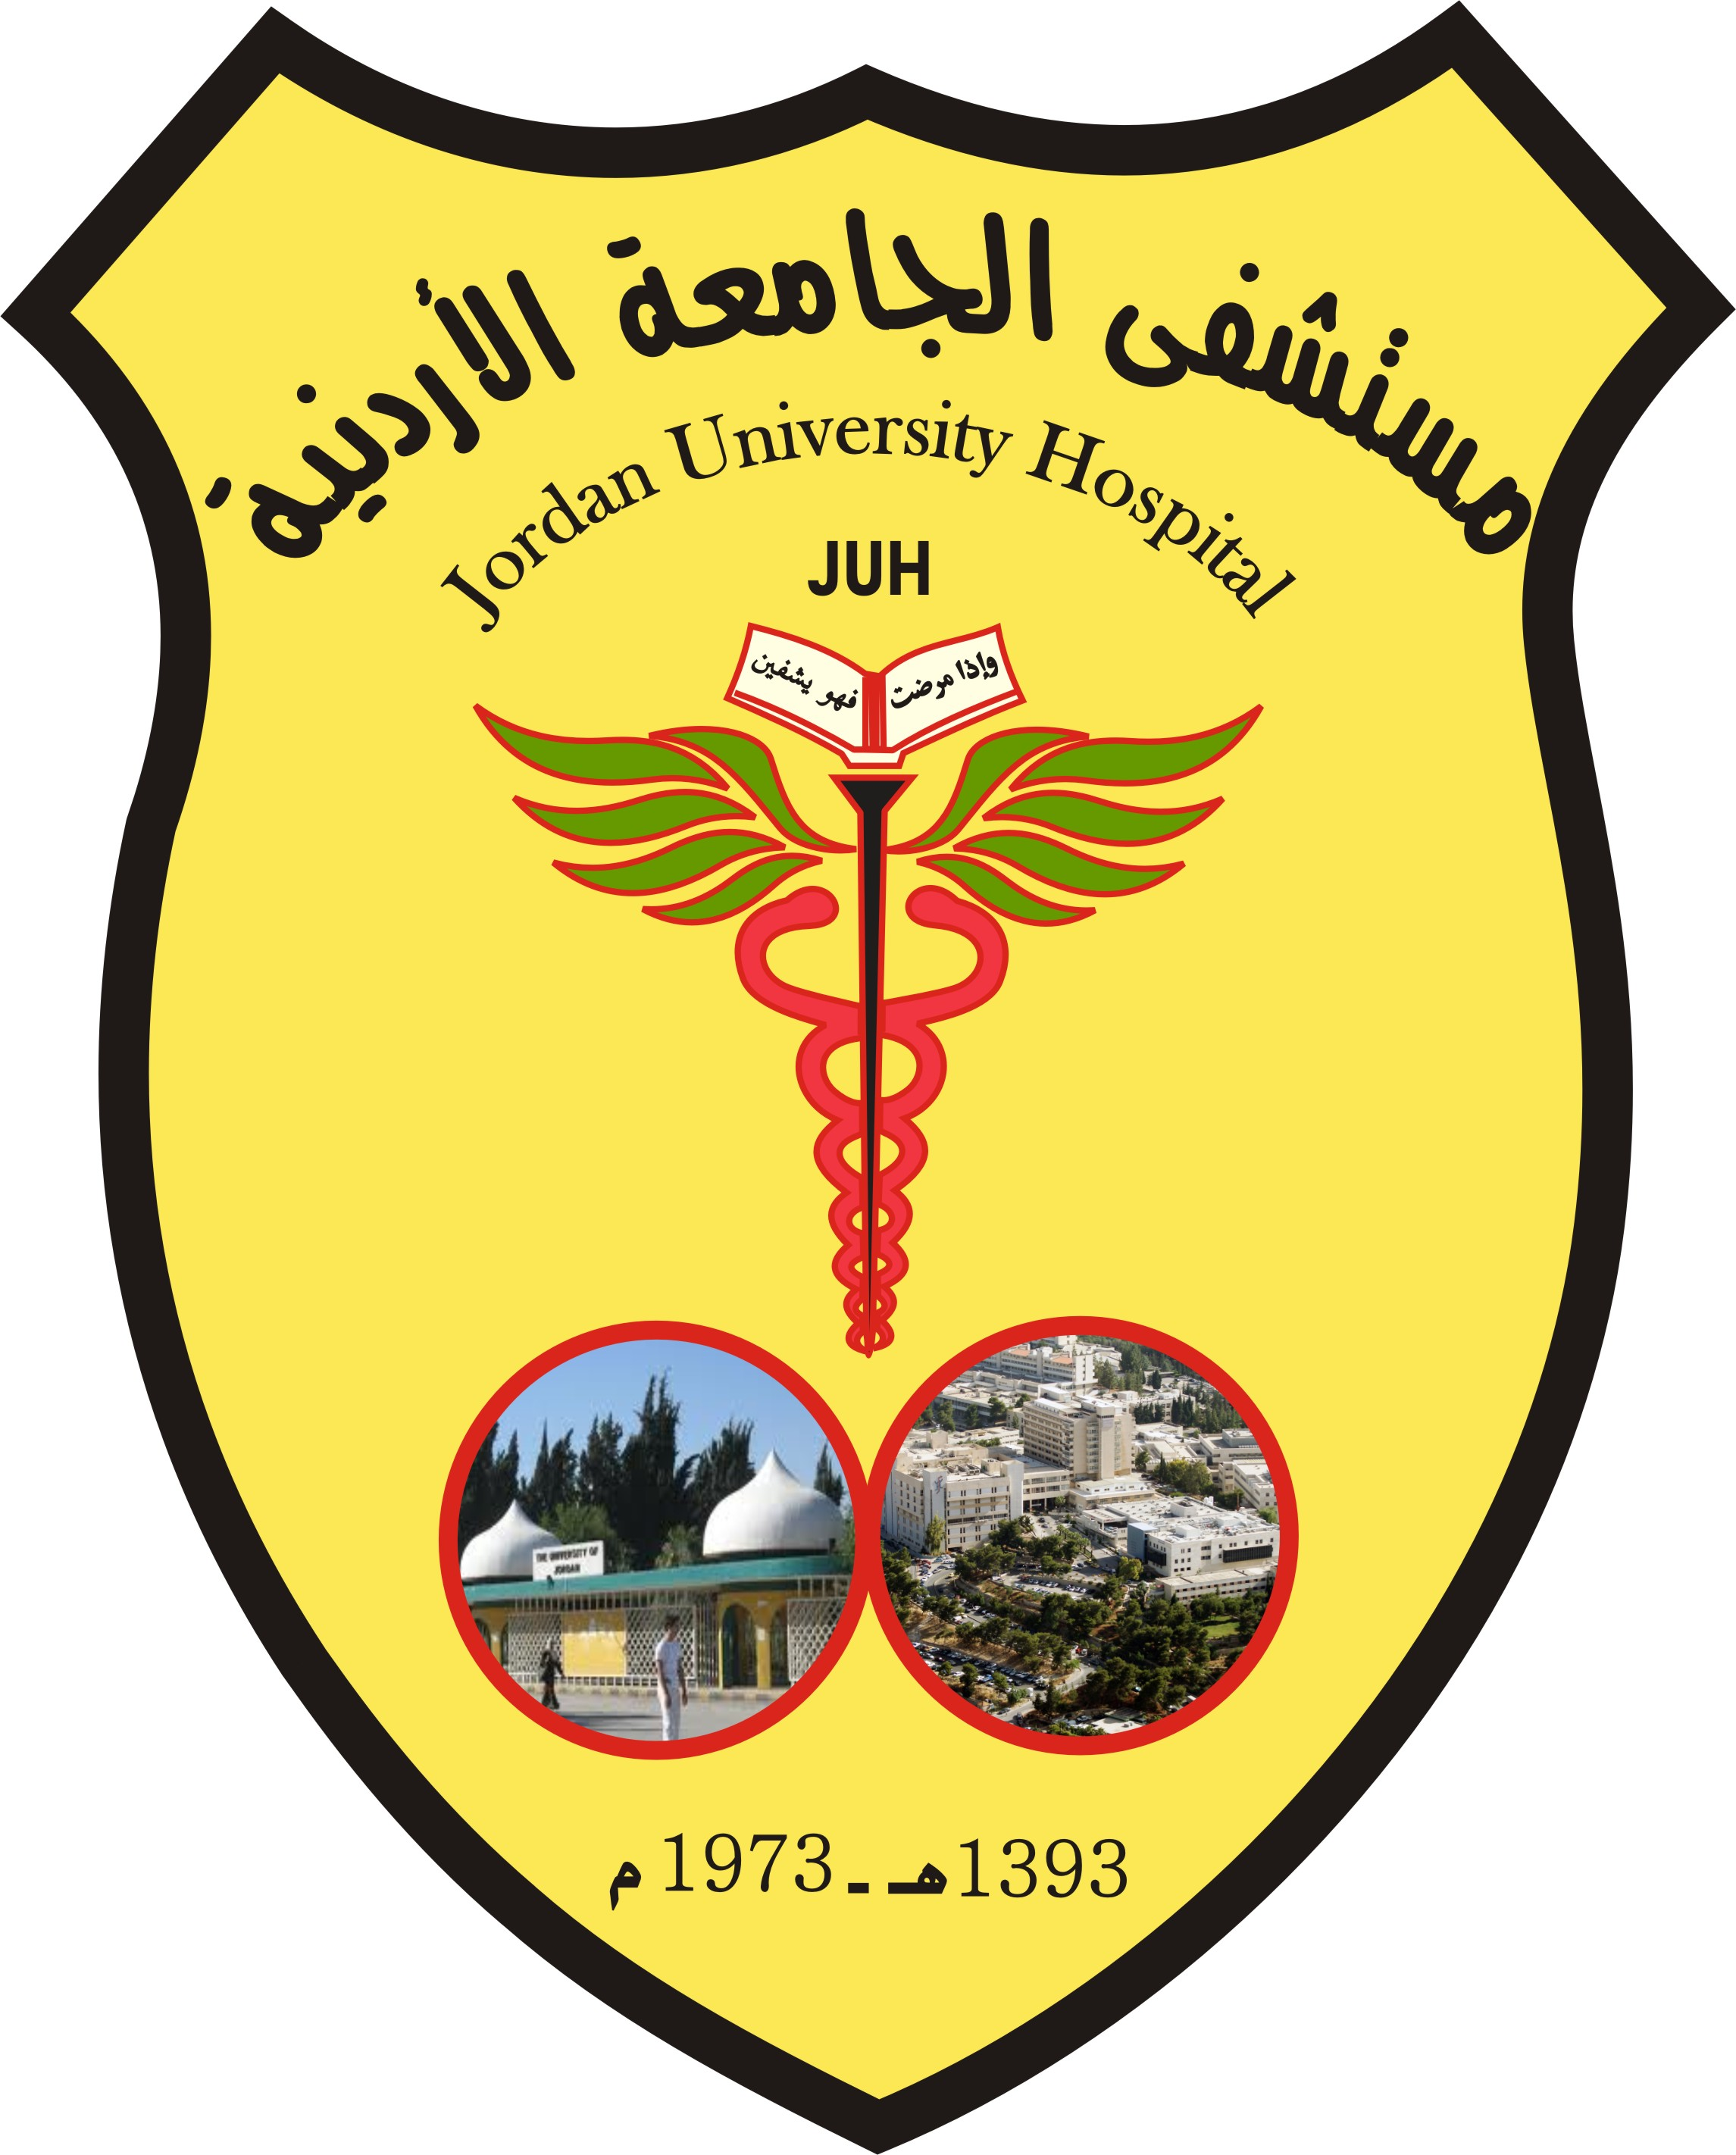 jordan university hospital